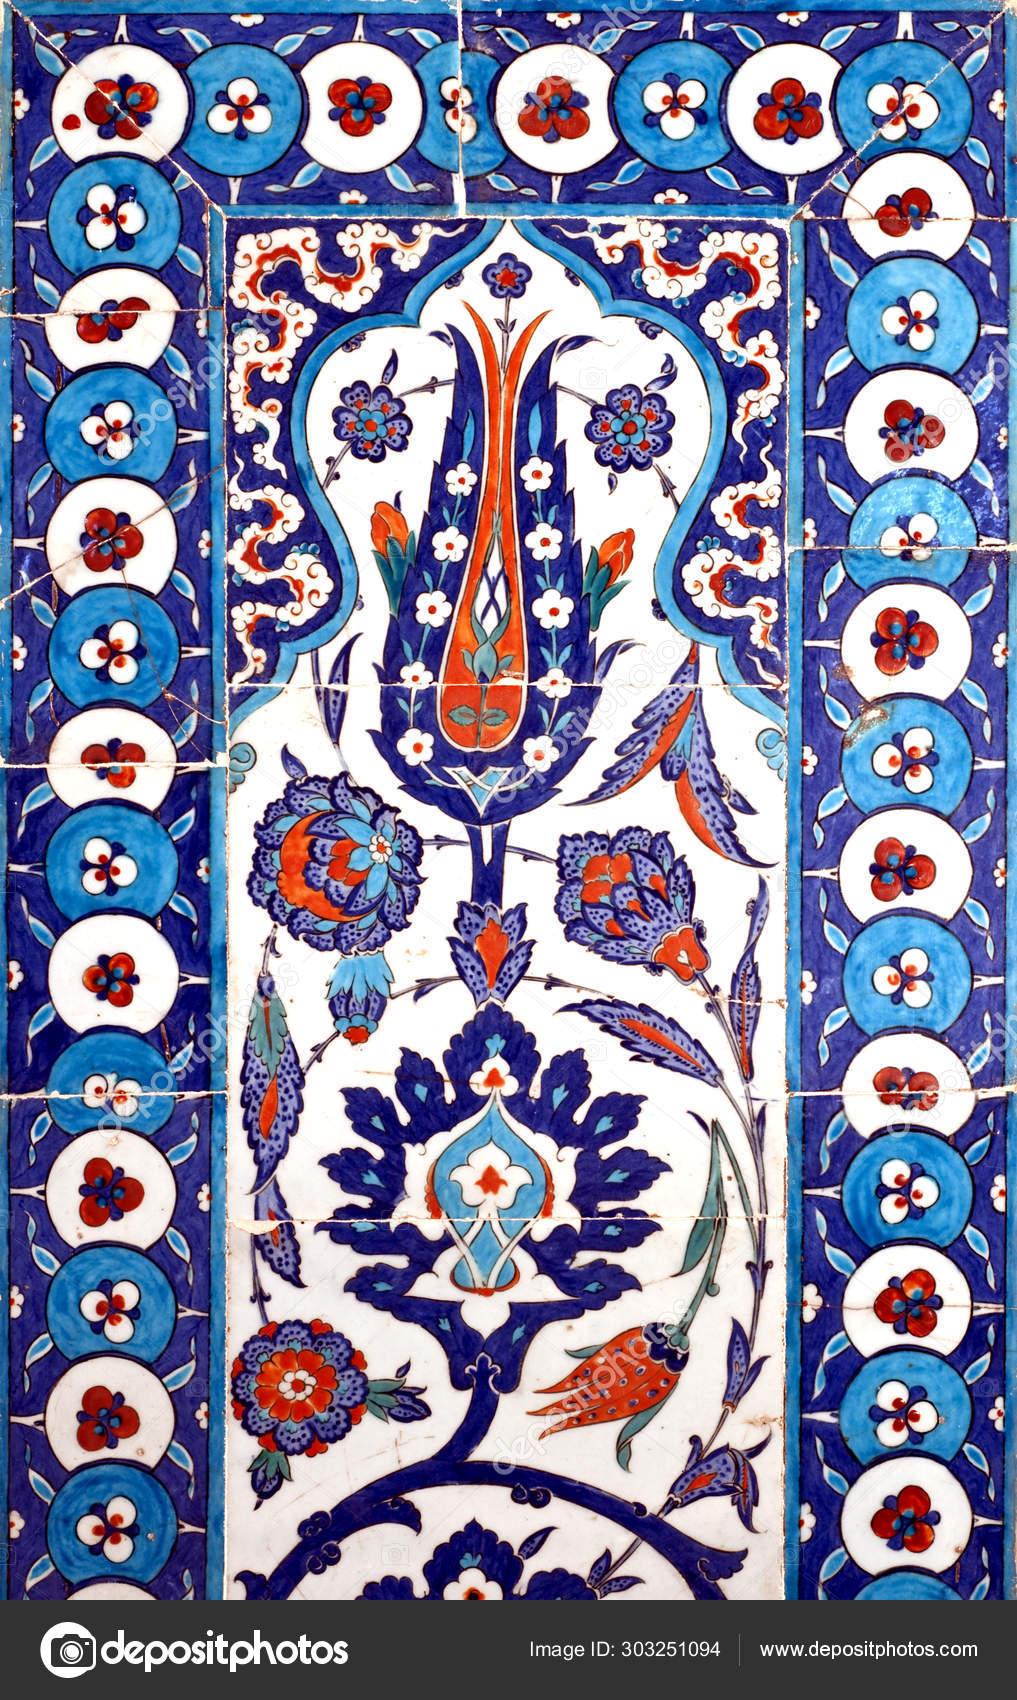 iznik tile ancient ottoman era tiles were decorated master artisans stock photo image by c kuzeyliden 303251094